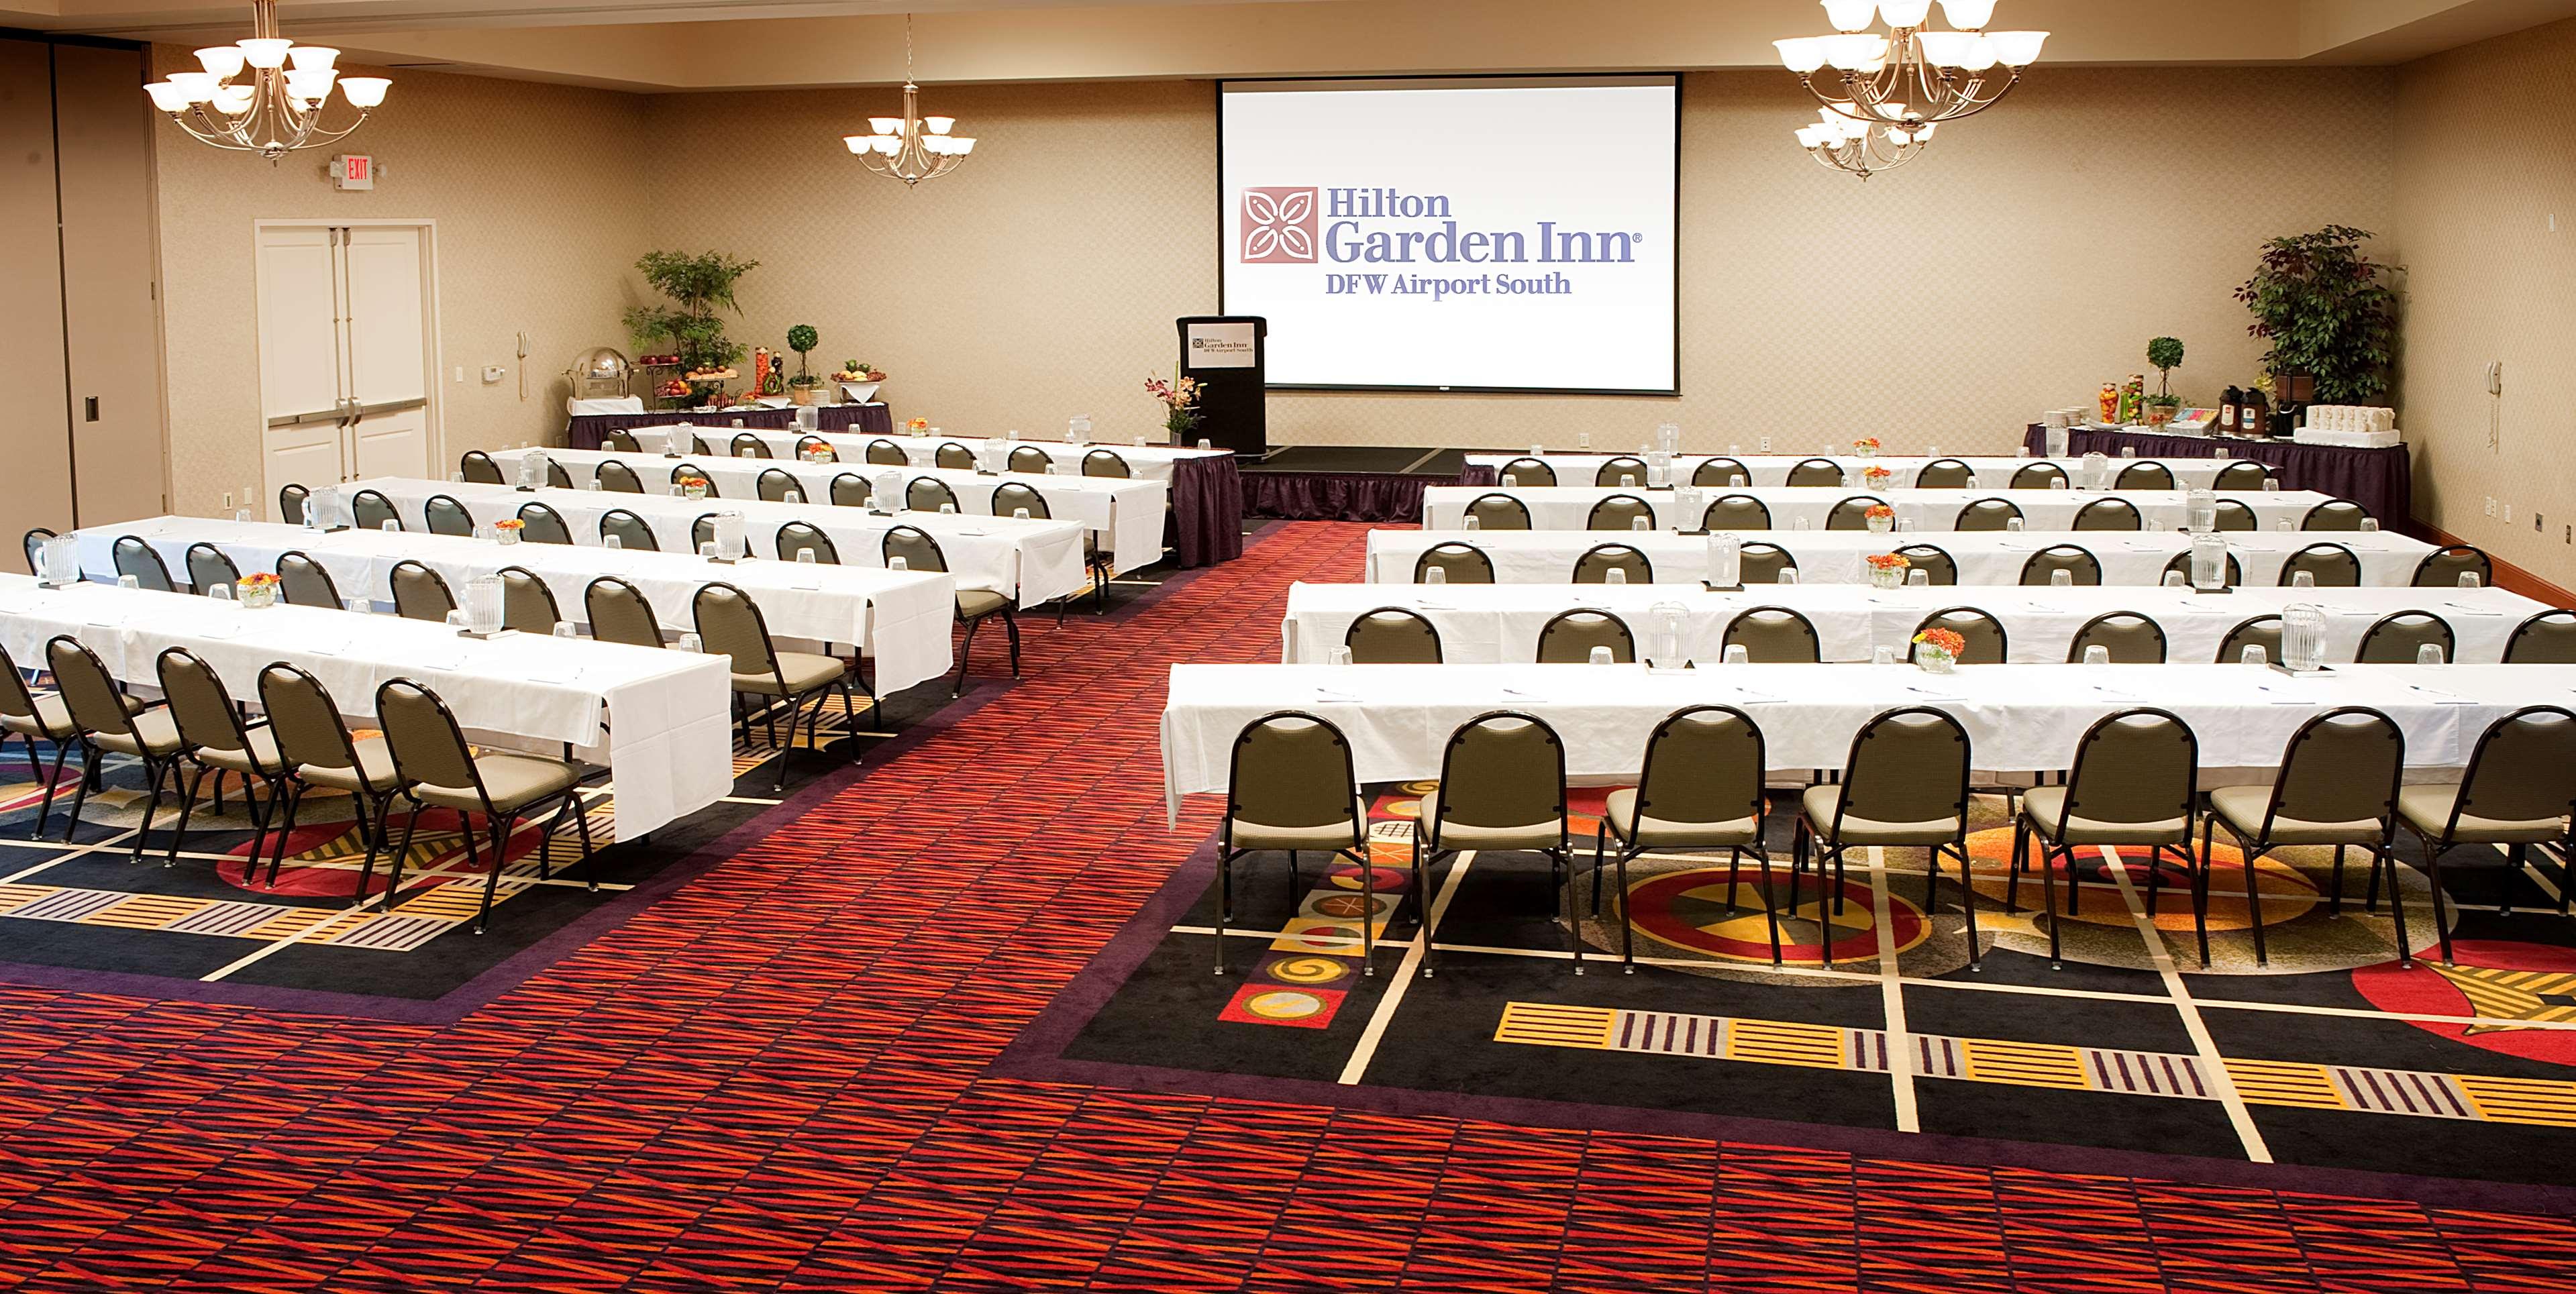 Hilton Garden Inn DFW Airport South image 50